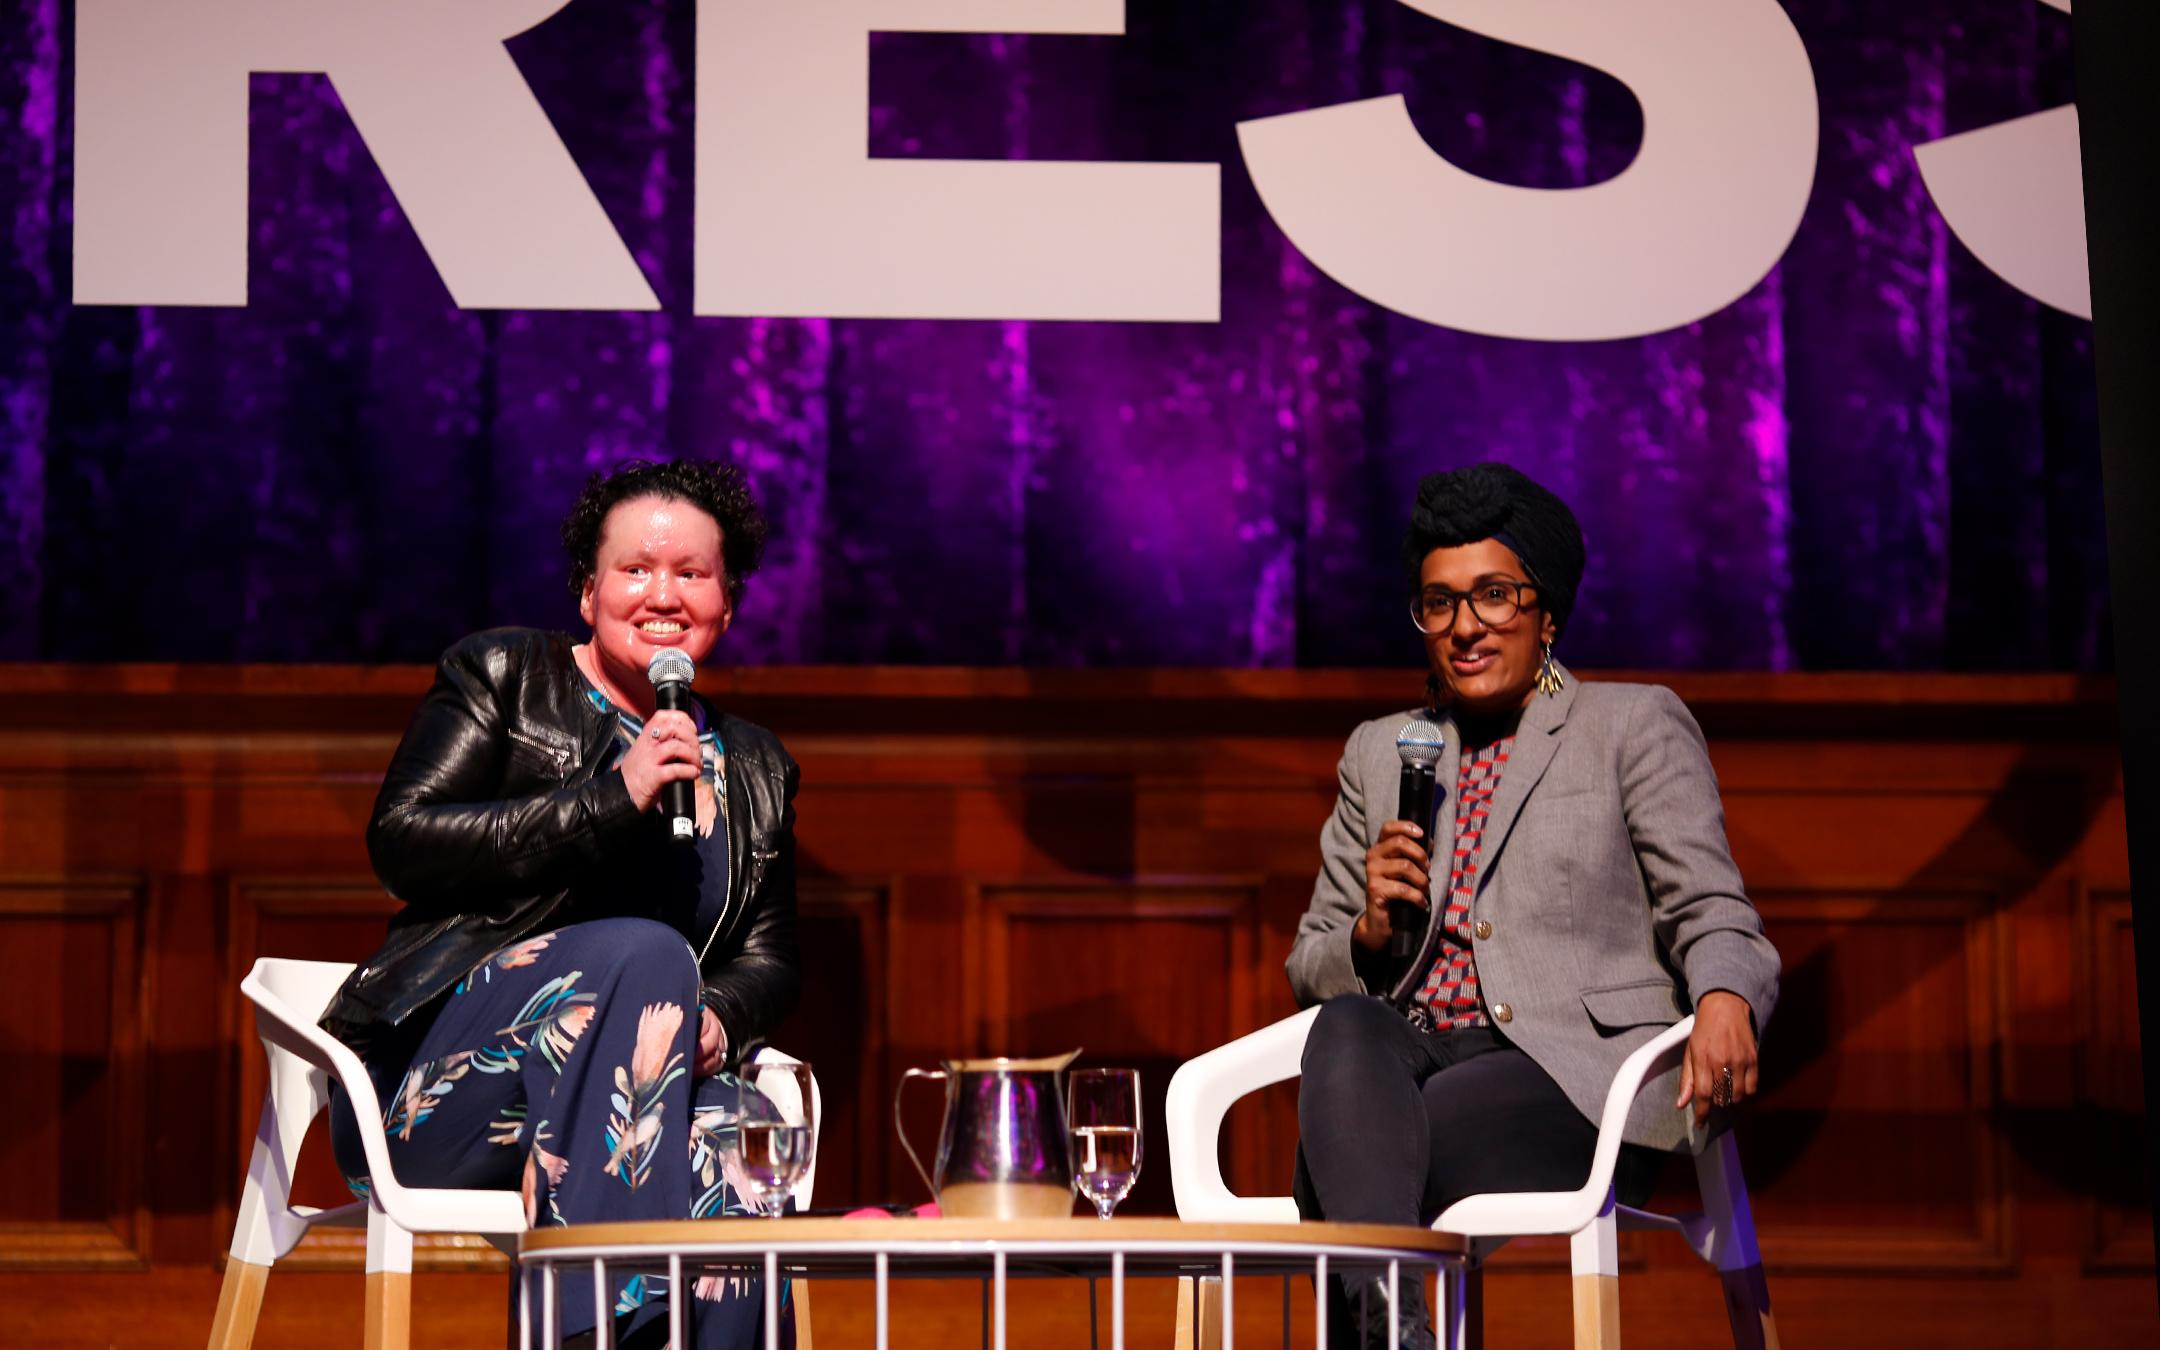 Carly Findlay and Shen Narayanasamy on stage